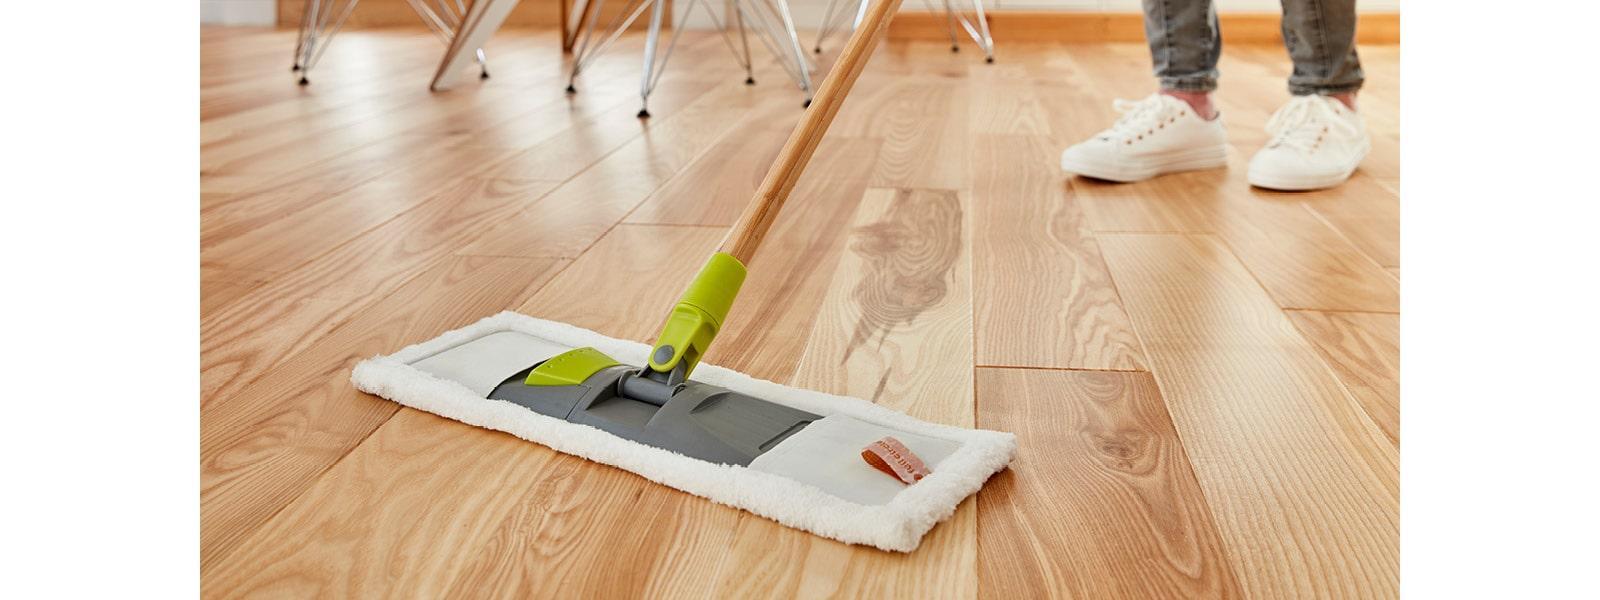 wood floor being swept